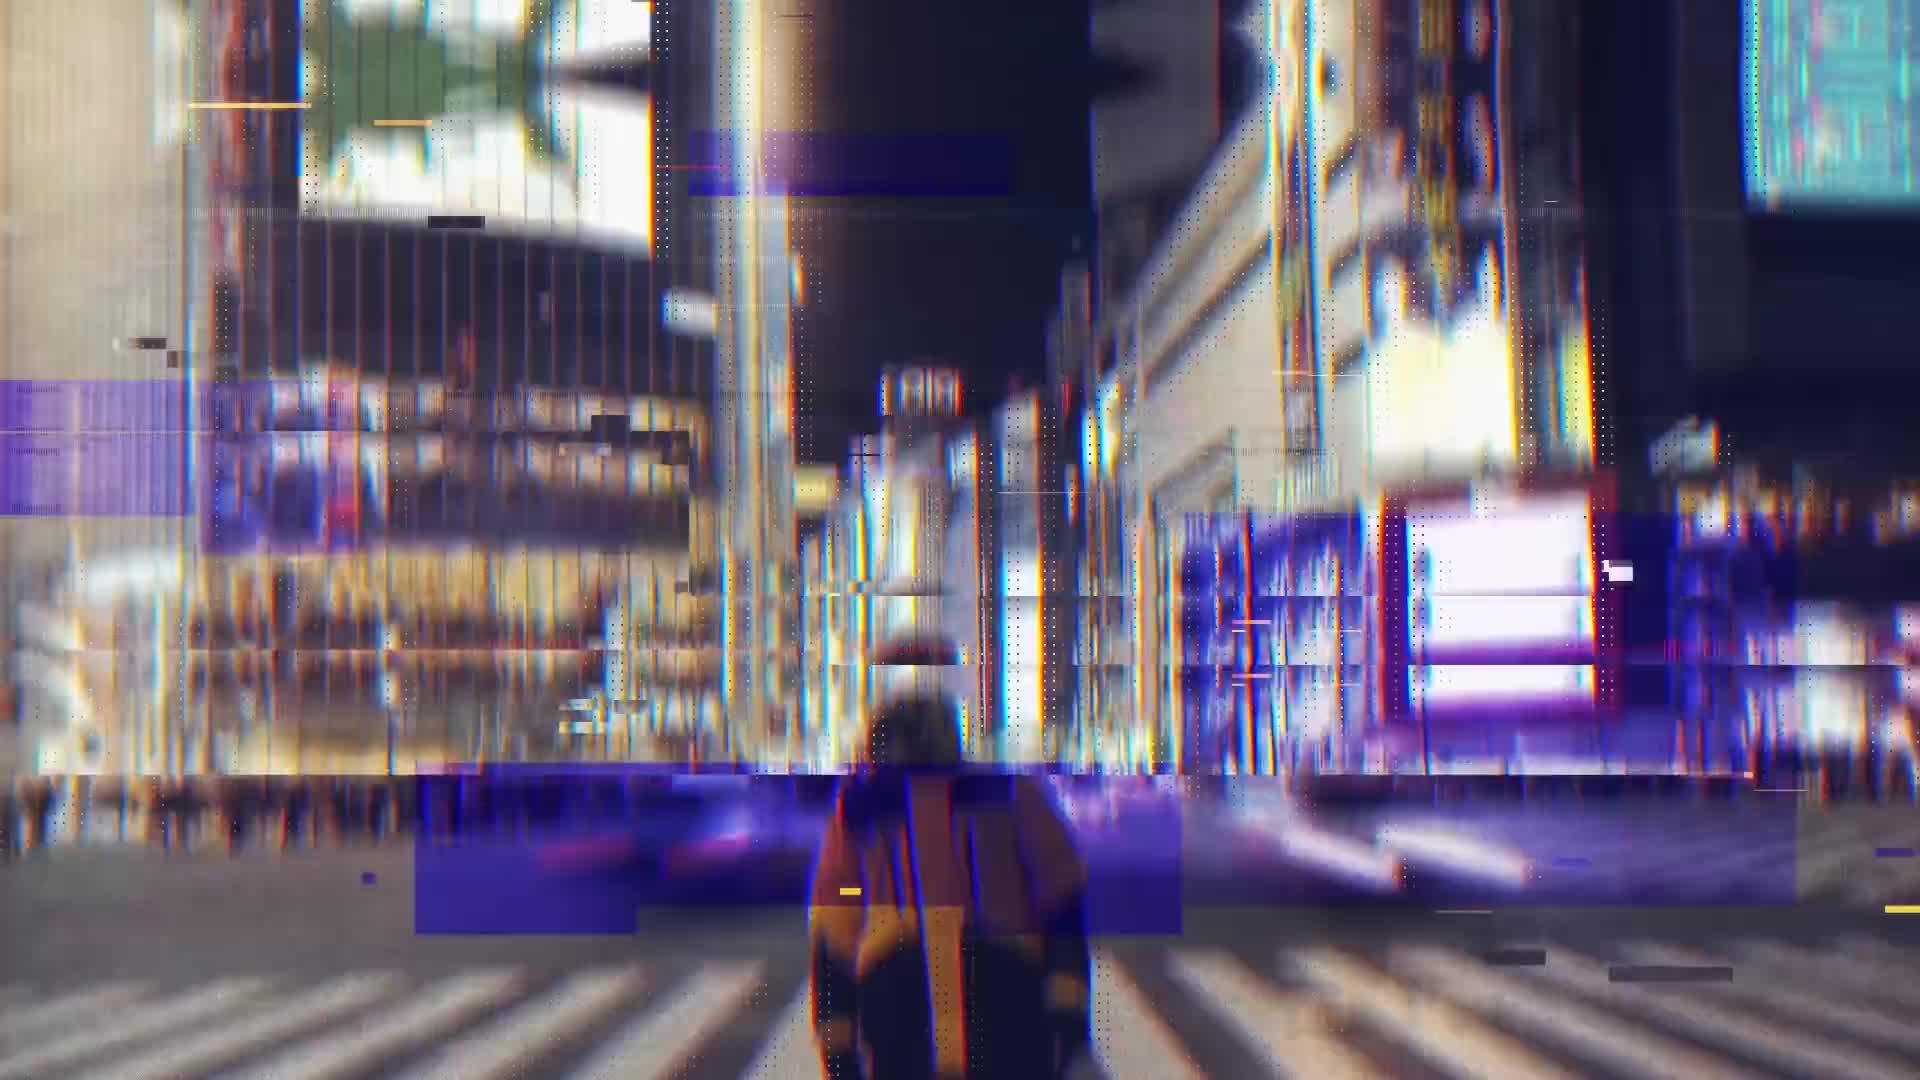 Kekra – 9 Milli, réalisation Cody MacFly & Kekra